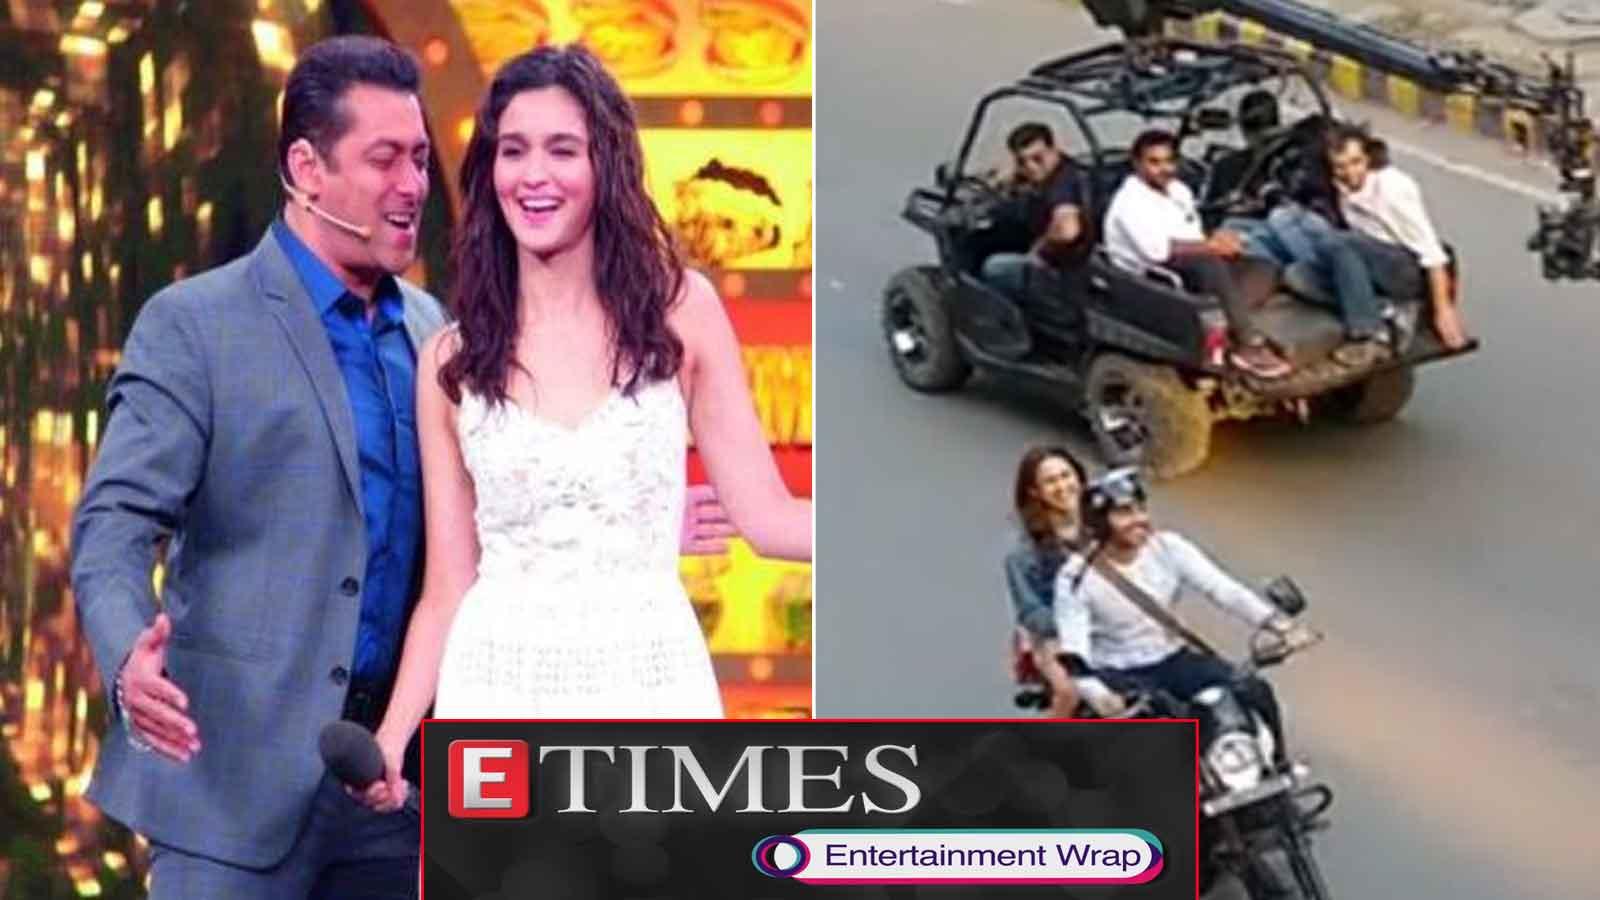 salman-khan-to-romance-alia-bhatt-in-bhansalis-inshallah-kartik-aaryan-sara-ali-khans-bike-riding-scene-gets-leaked-and-more